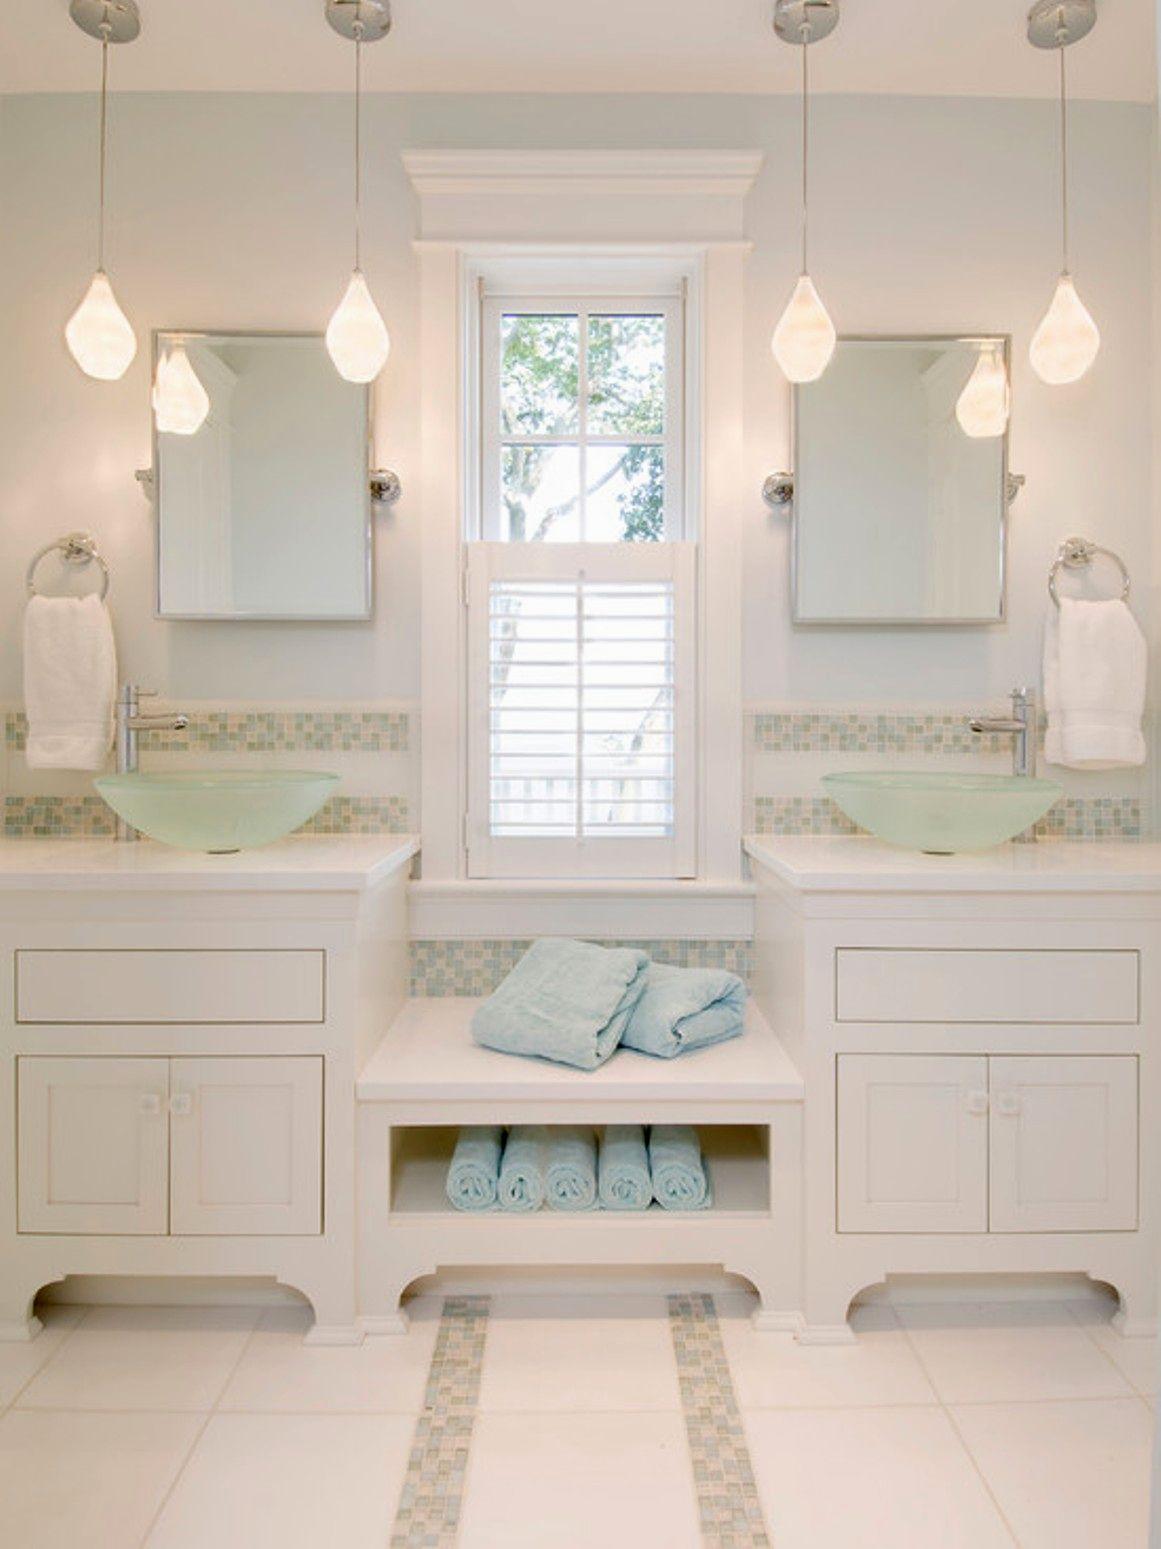 awesome small bathroom tiles design concept-Contemporary Small Bathroom Tiles Design Architecture